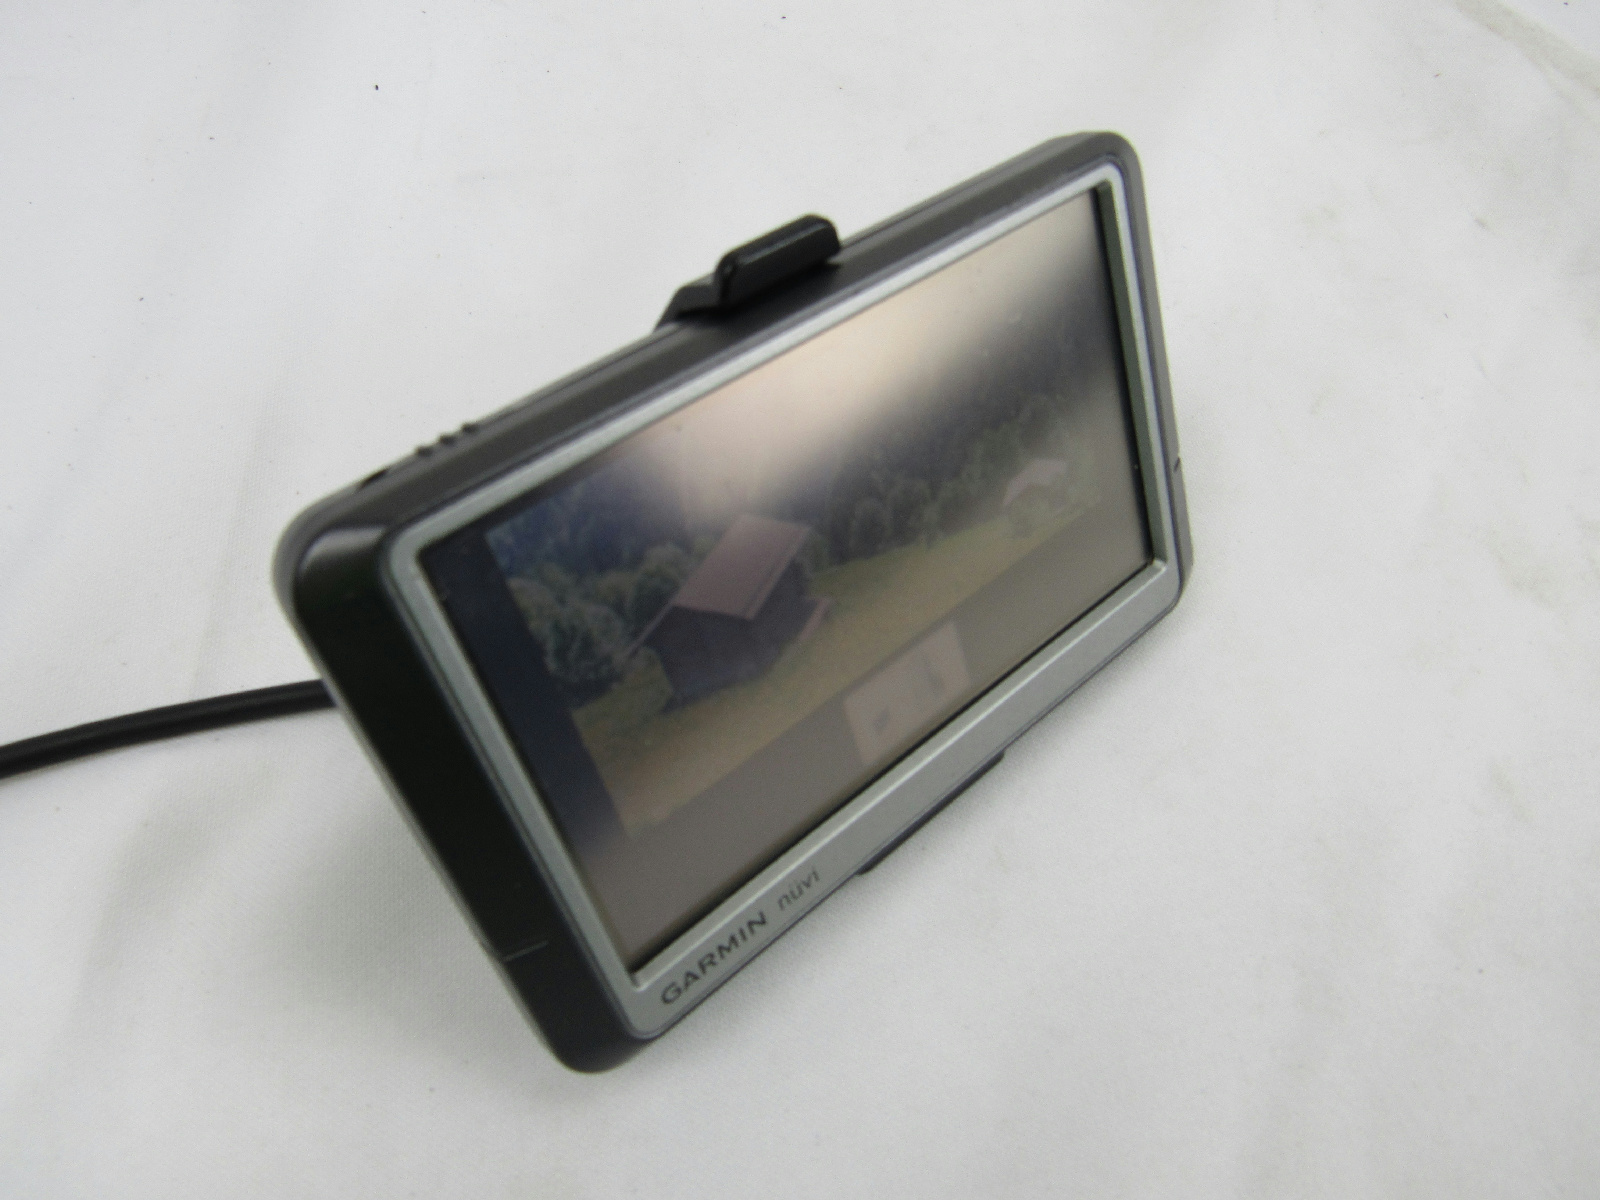 garmin nuvi 260w gps auto navigation system ebay. Black Bedroom Furniture Sets. Home Design Ideas